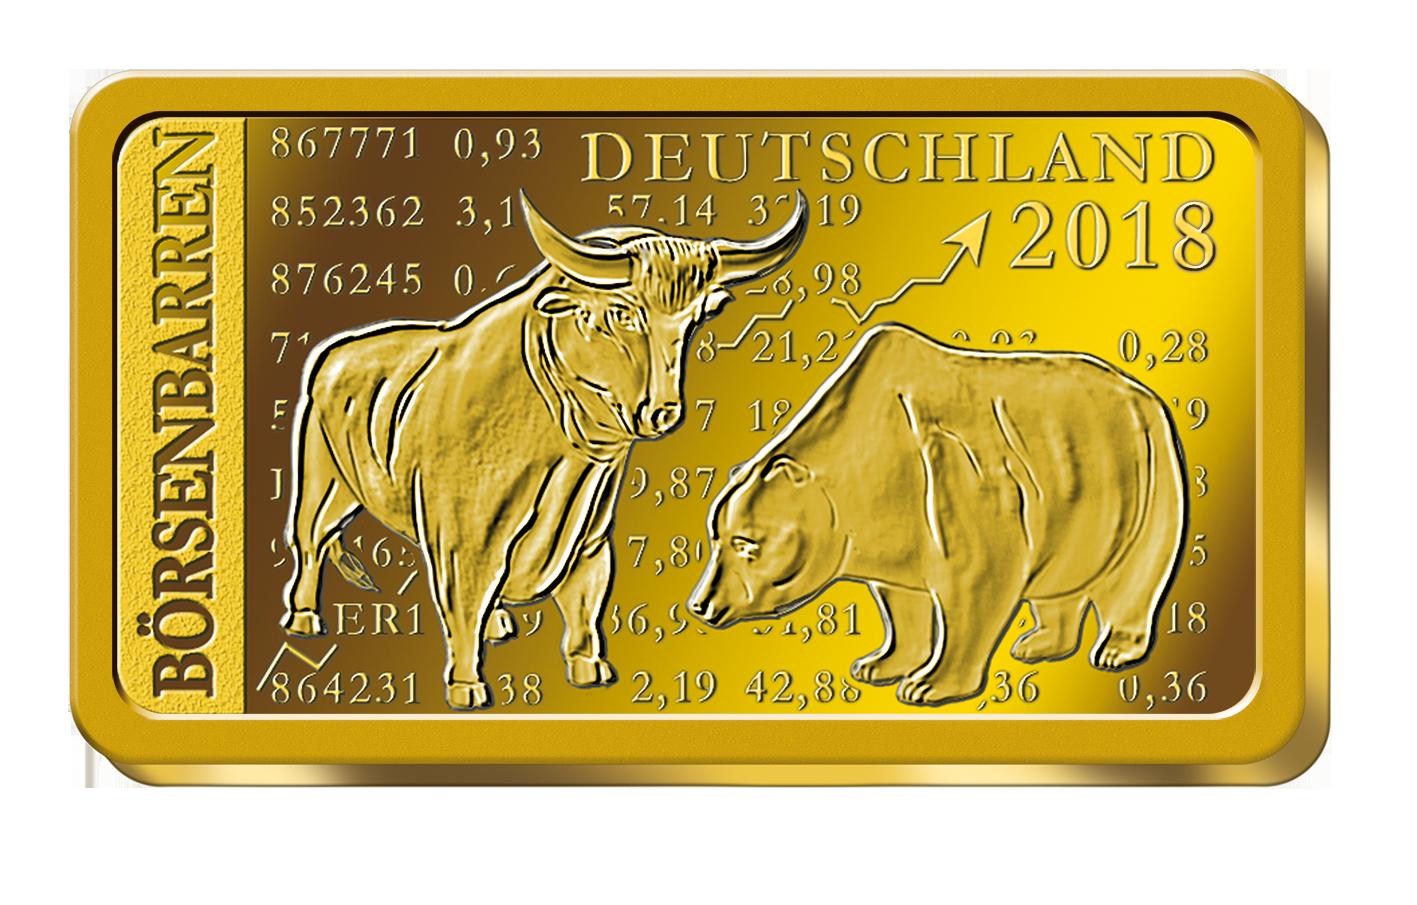 Goldbarren Börsenbarren Deutschland 2018 Spiegelglanz Münzen